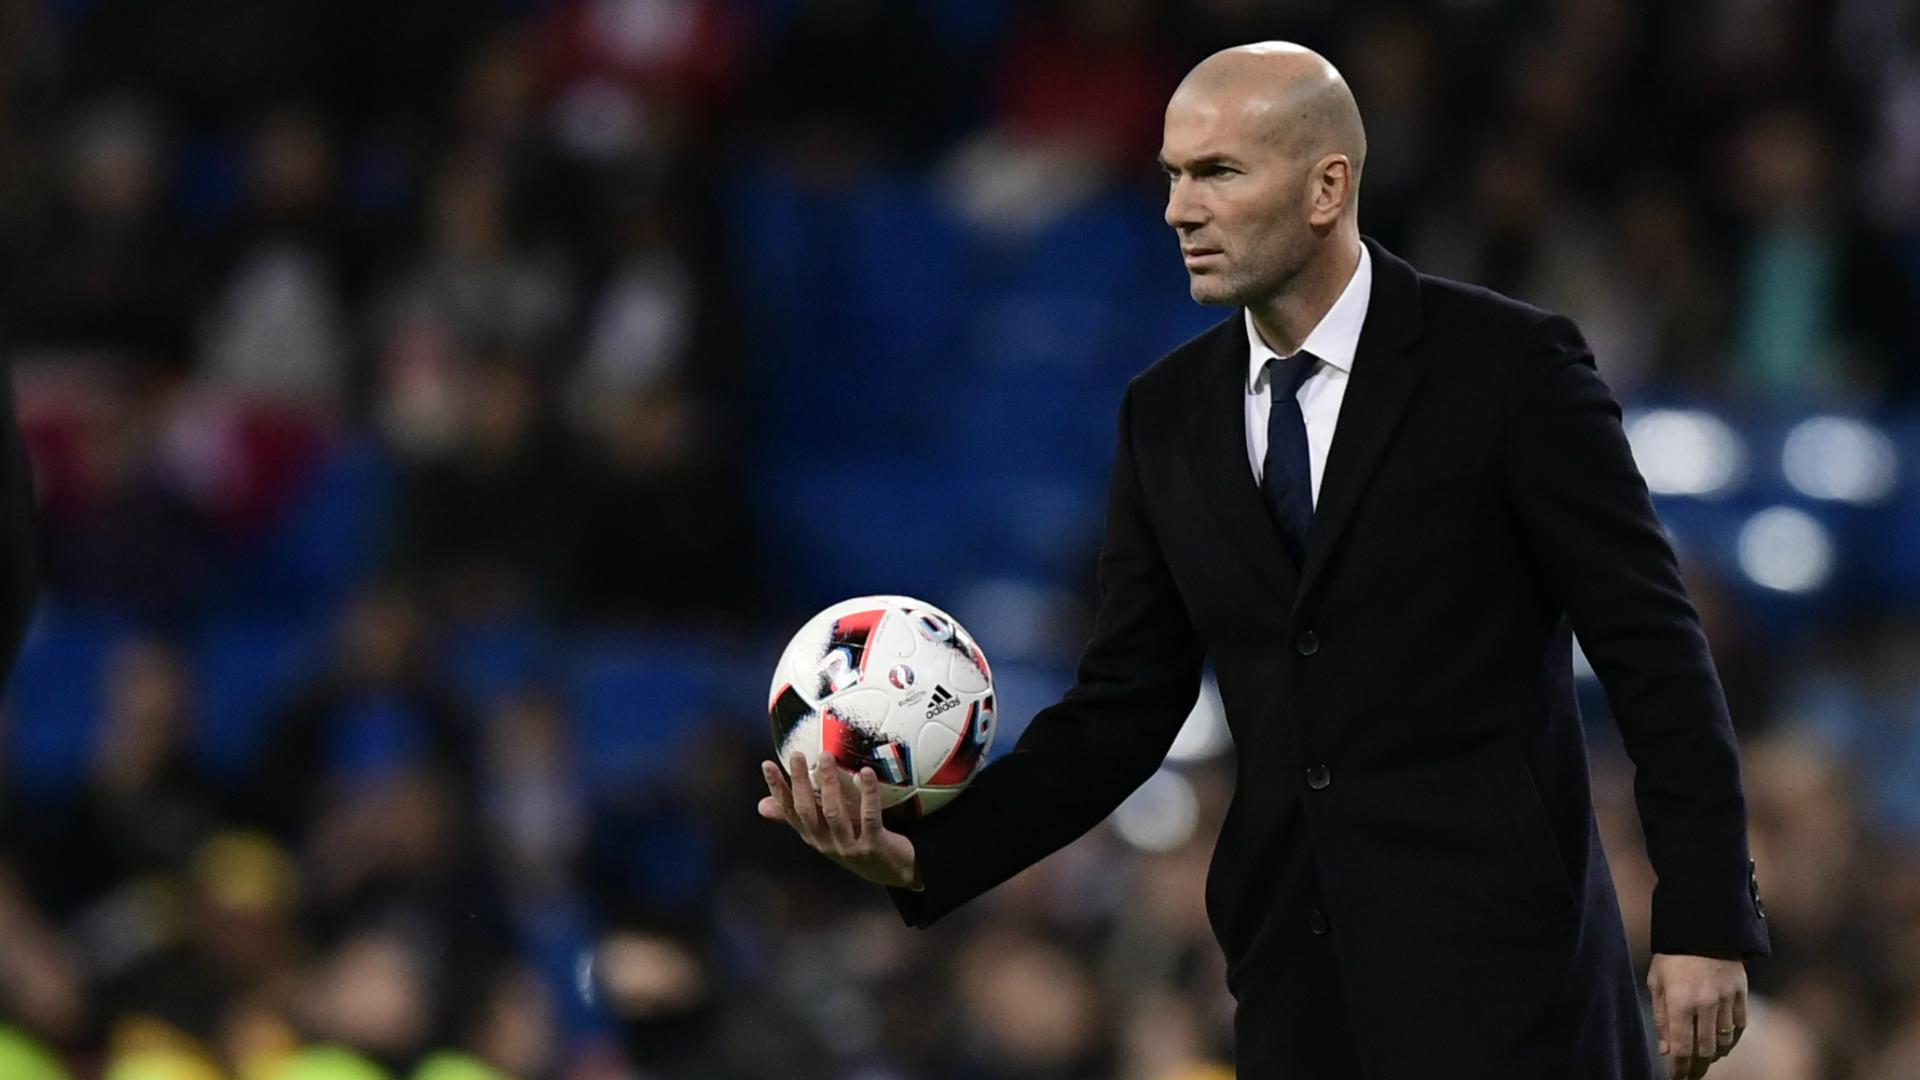 zinedine-zidane-real-madrid-cultural-copa-del-rey_1l7400og6vydg1hfo5mc4yhk91 Real Madrid ta kara wa Zidane kwantaragin shekara uku